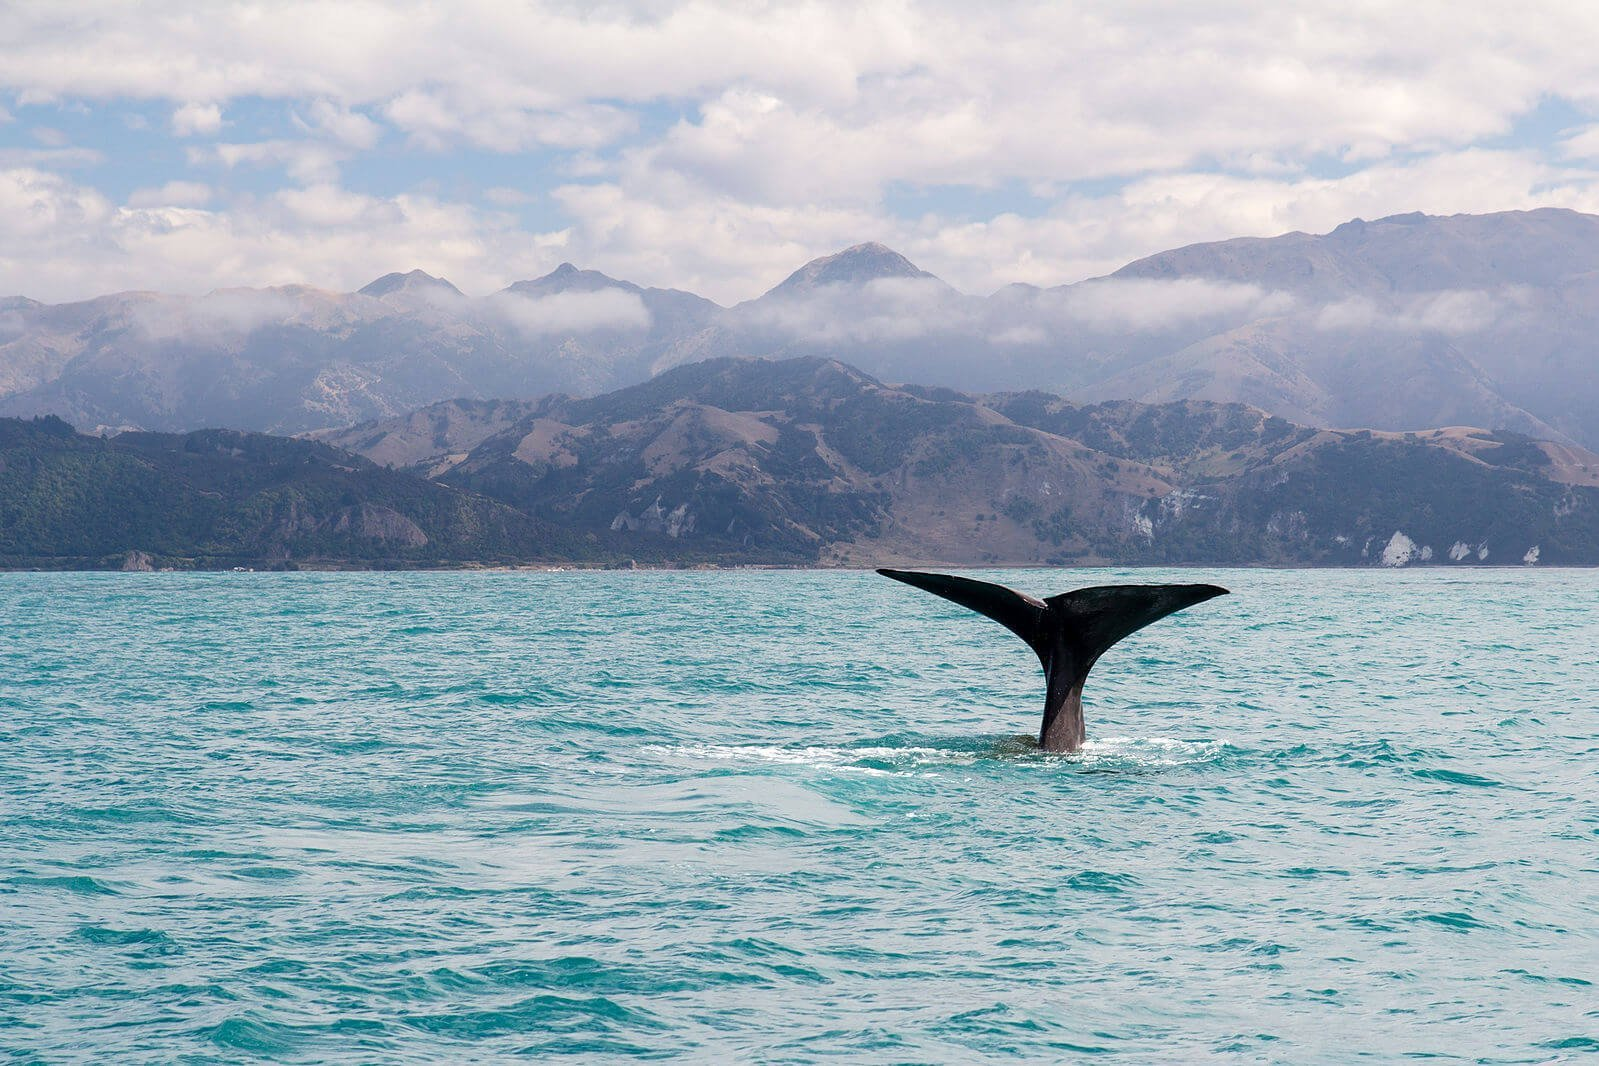 Walvissen spotten in Kaikoura - Zuidereiland Nieuw-Zeeland